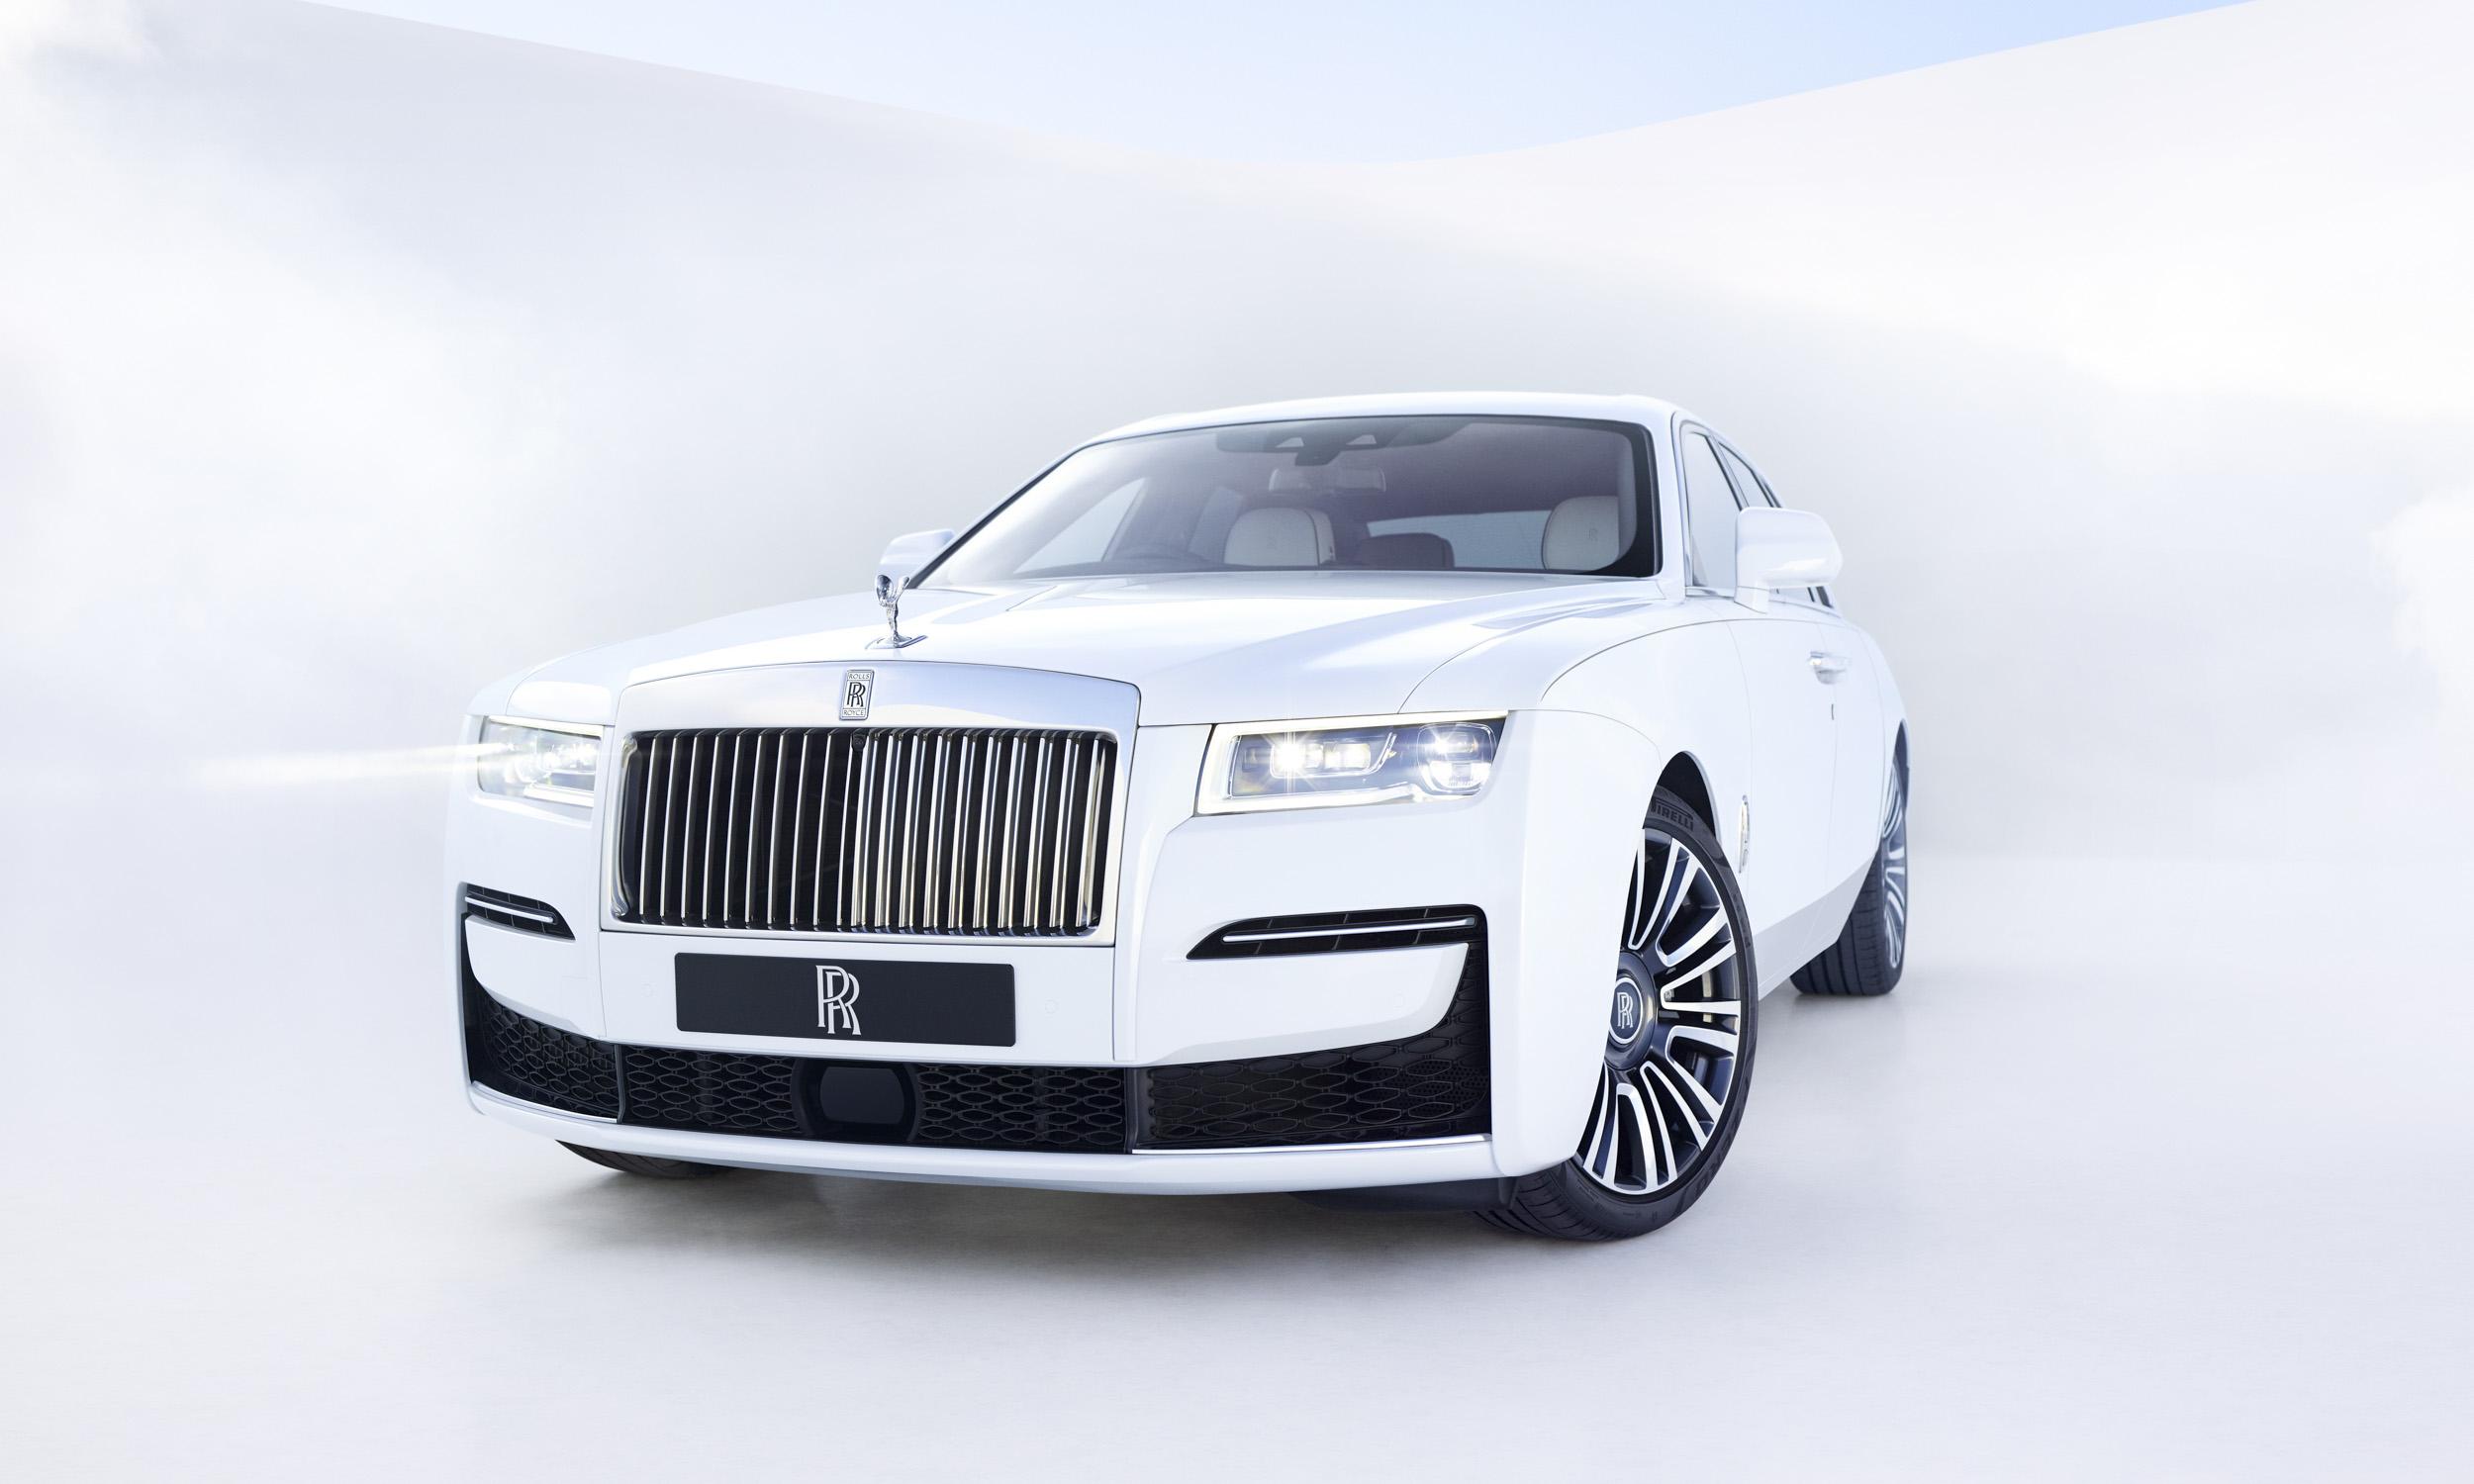 © Rolls-Royce Motor Cars